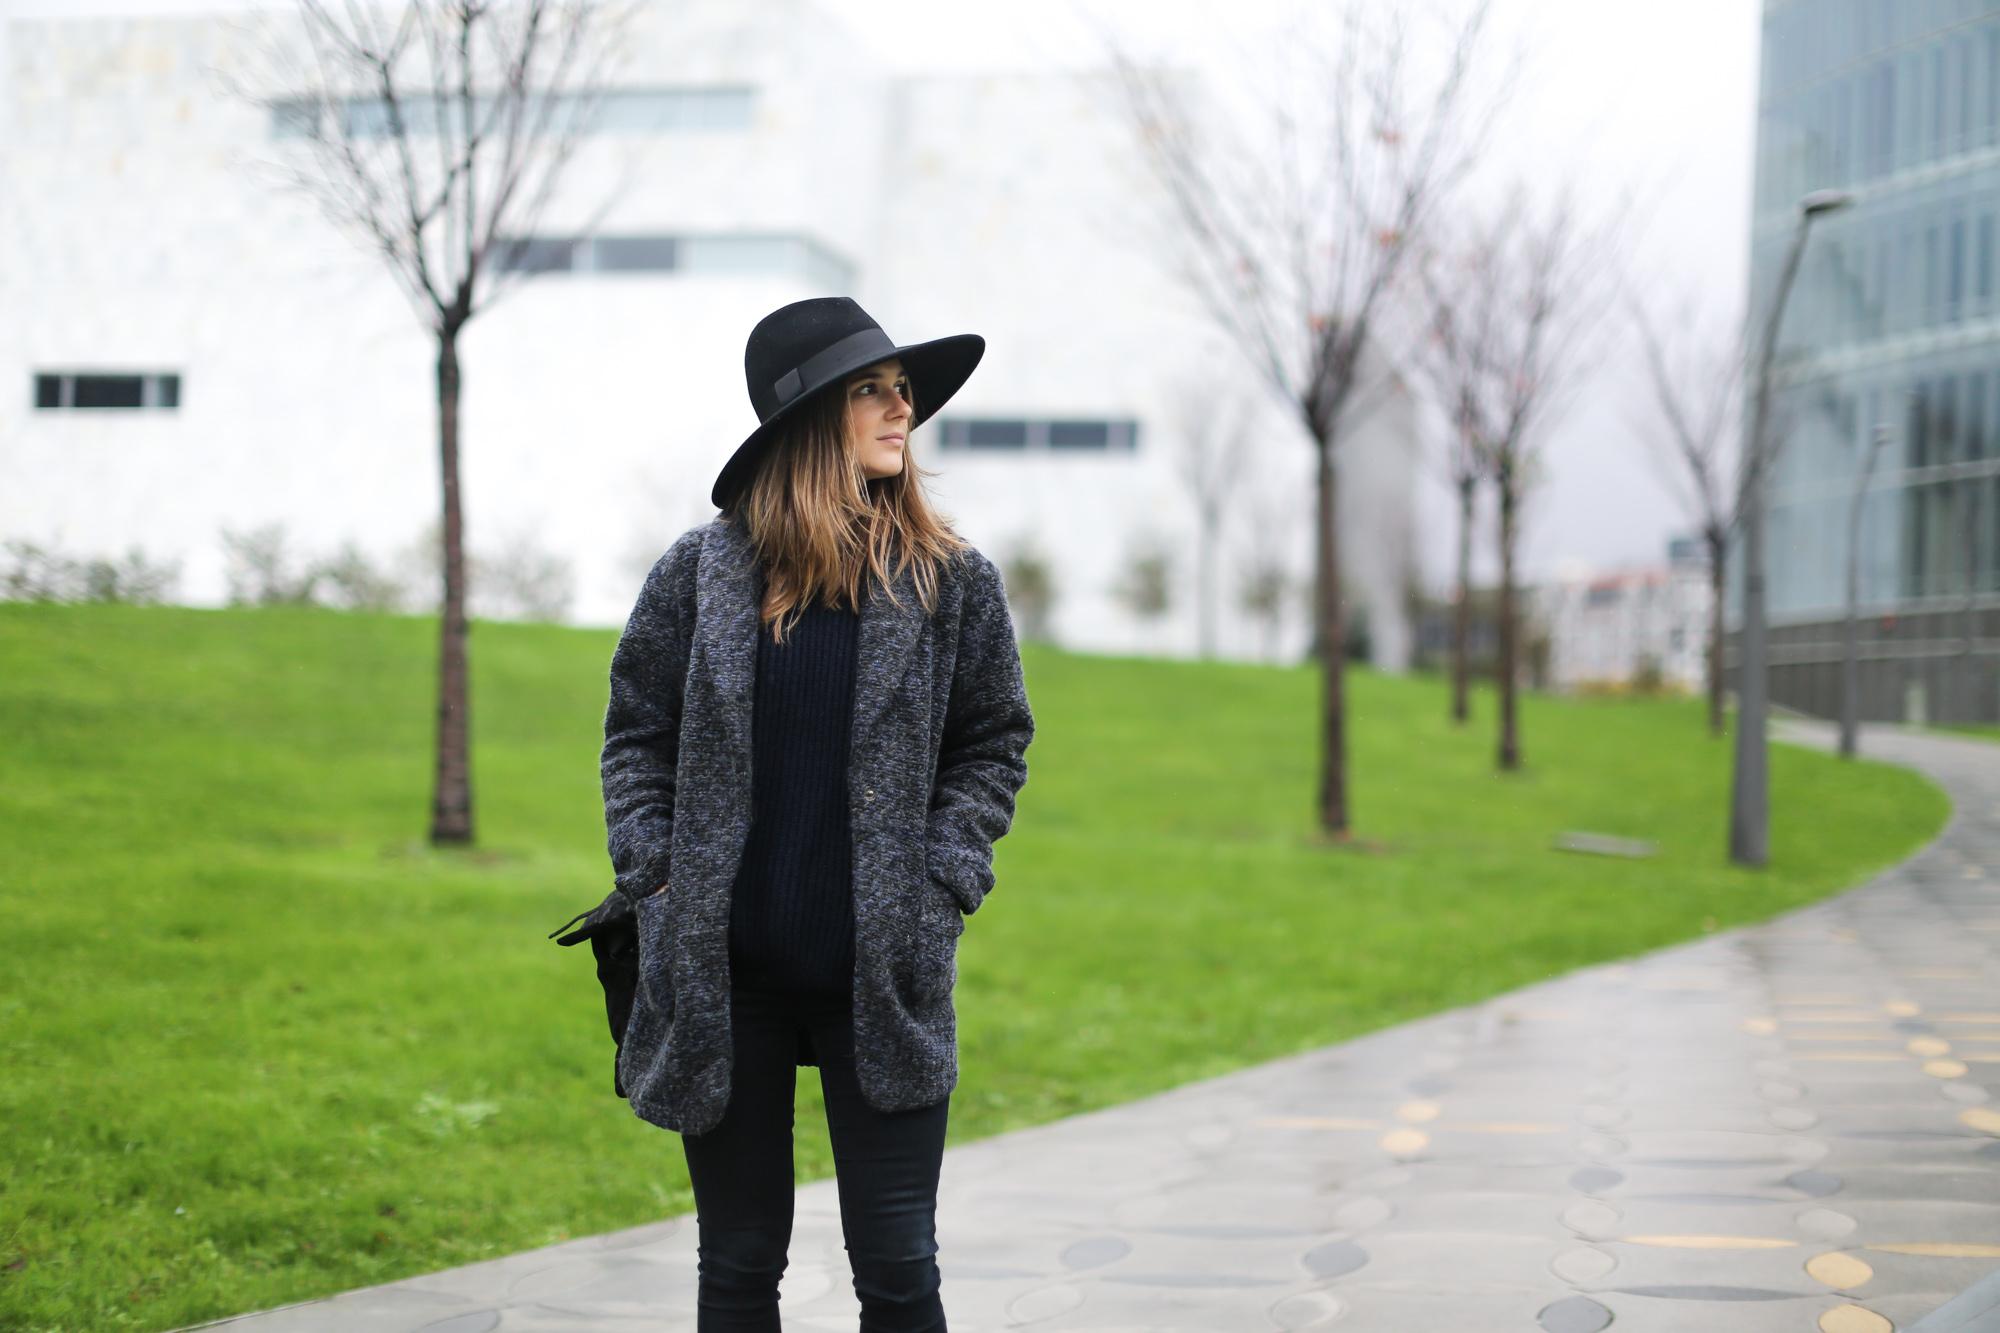 Clochet-streetstyle-mango-jacket-fedora-hat-kitten-heels-4